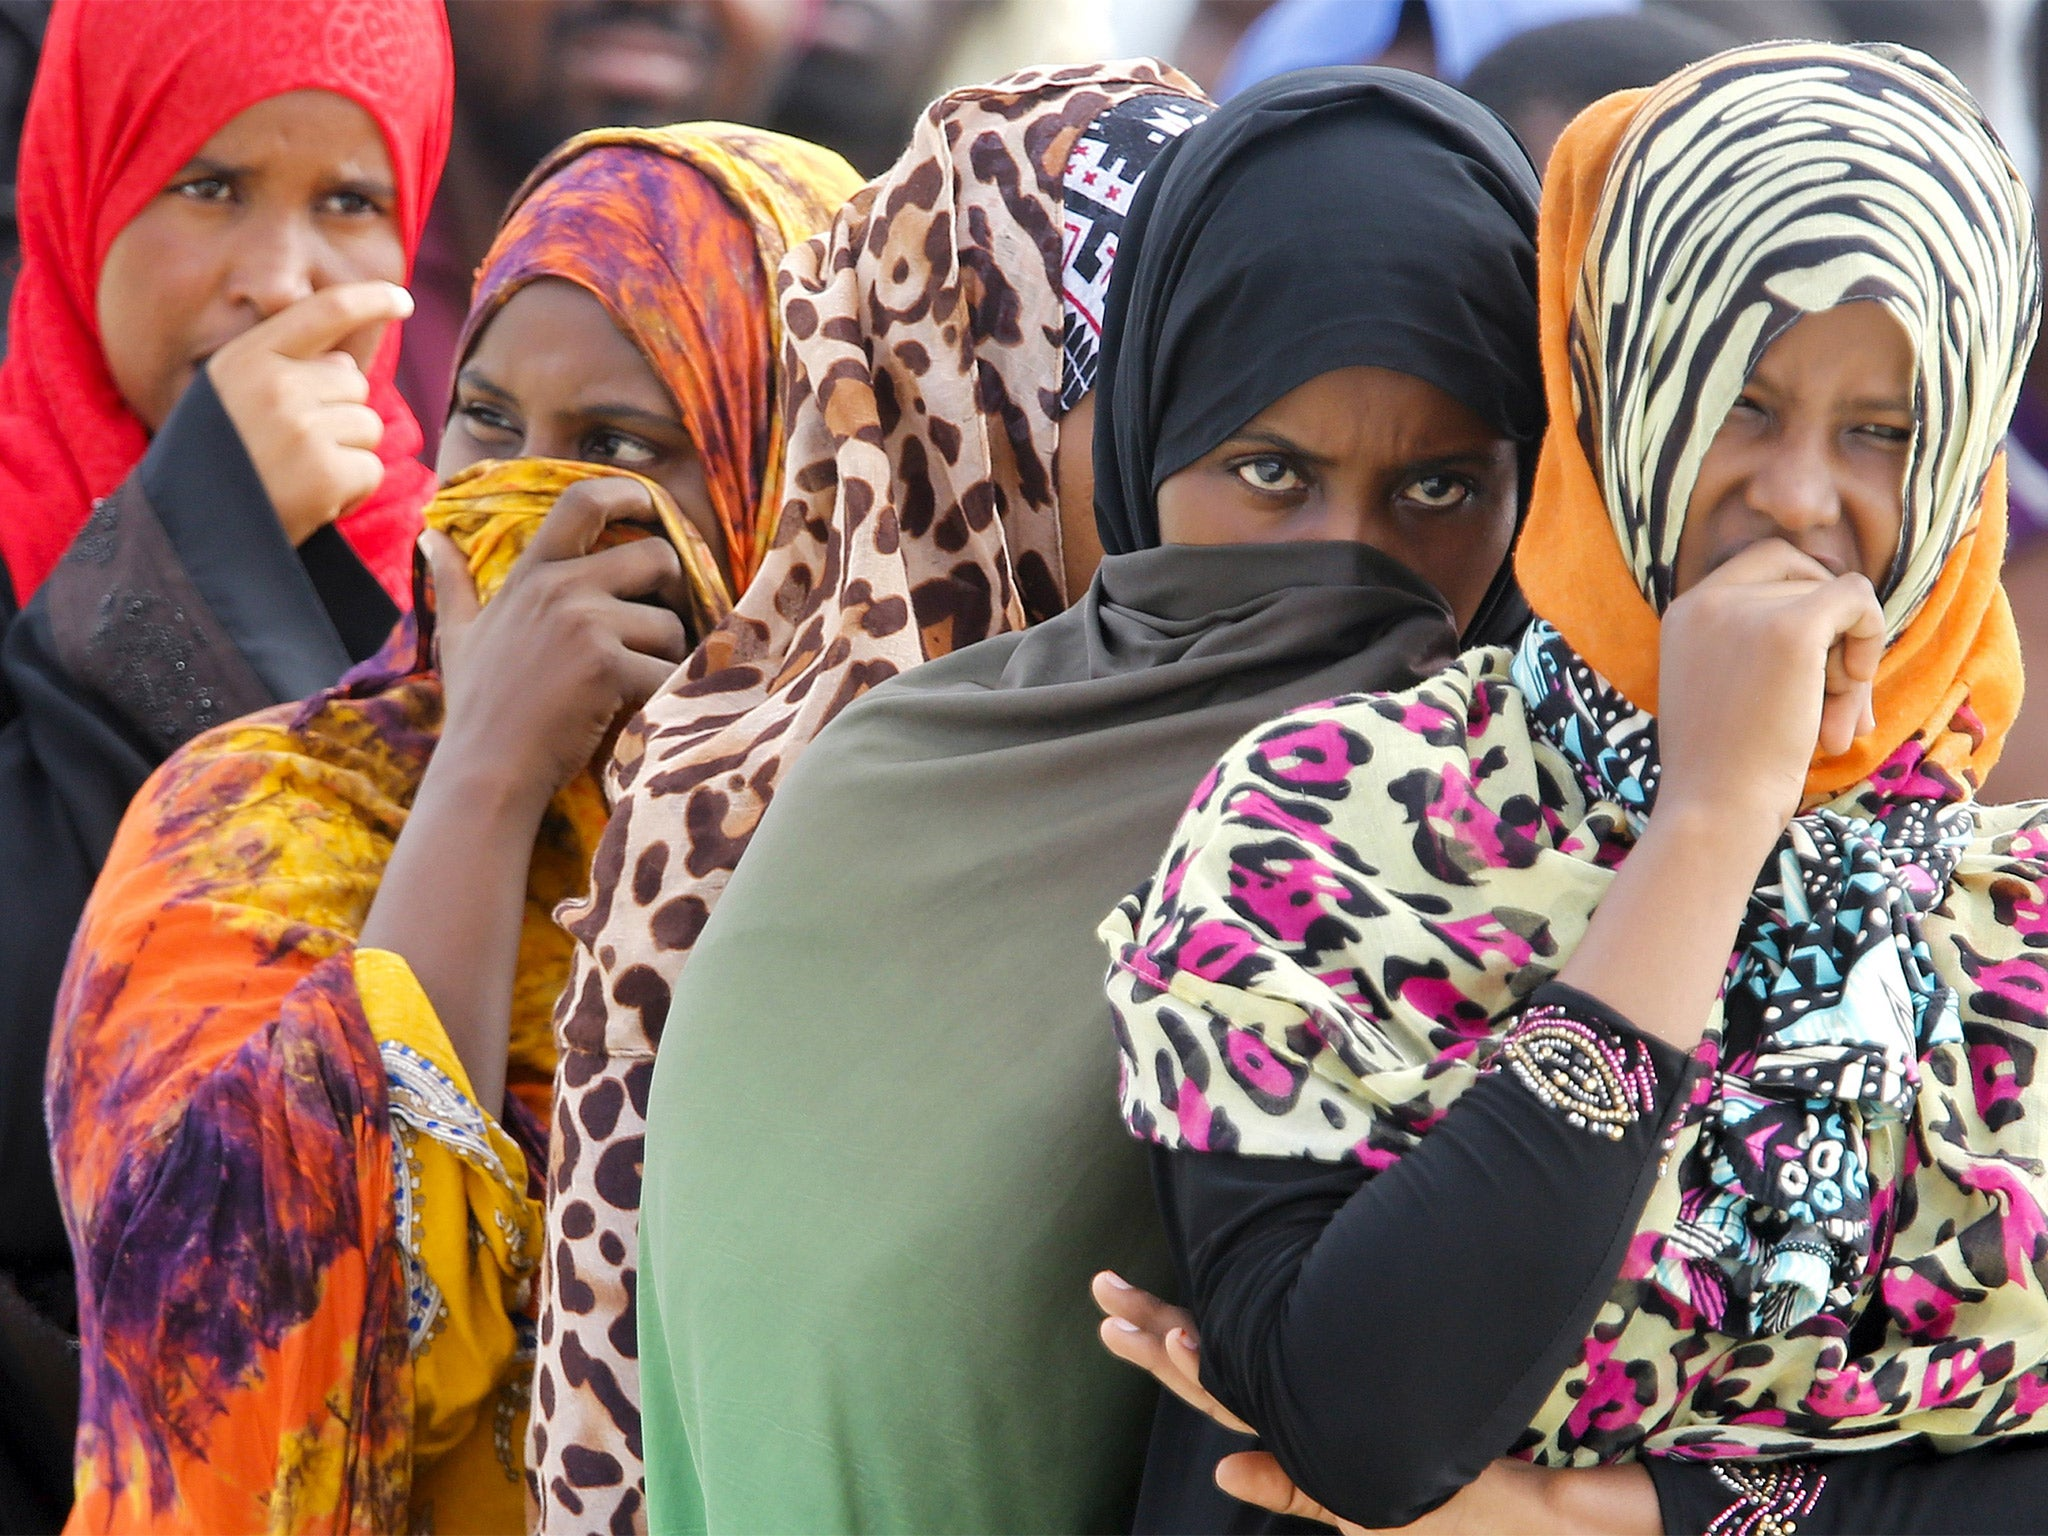 Migrant crisis: Francois Hollande and Angela Merkel tell Italy to sort true asylum-seekers from economic migrants